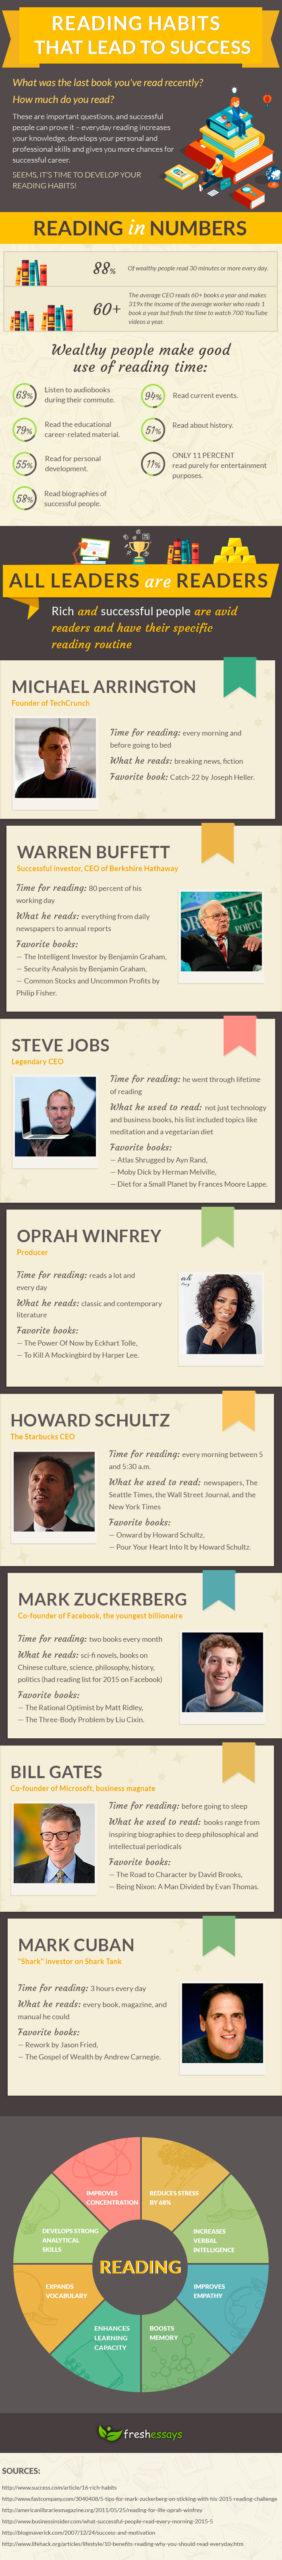 reading habits lead success